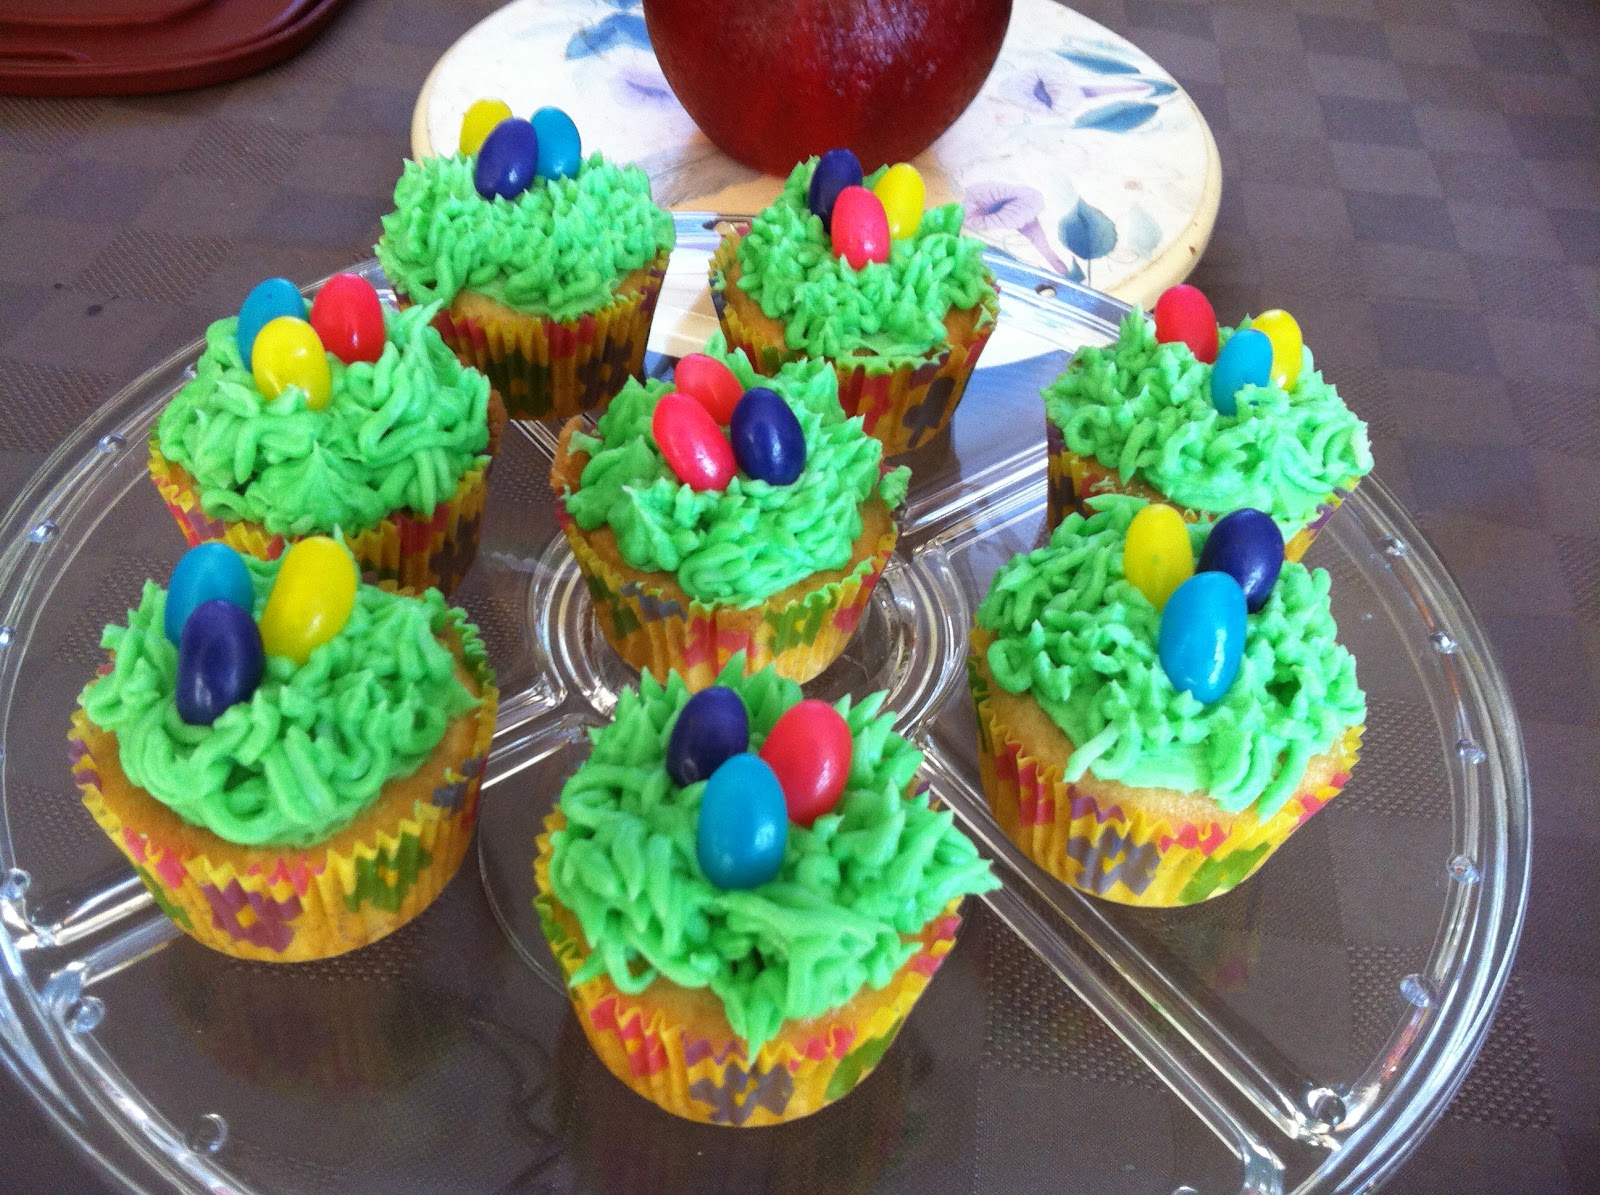 how to make delicious vanilla cupcakes